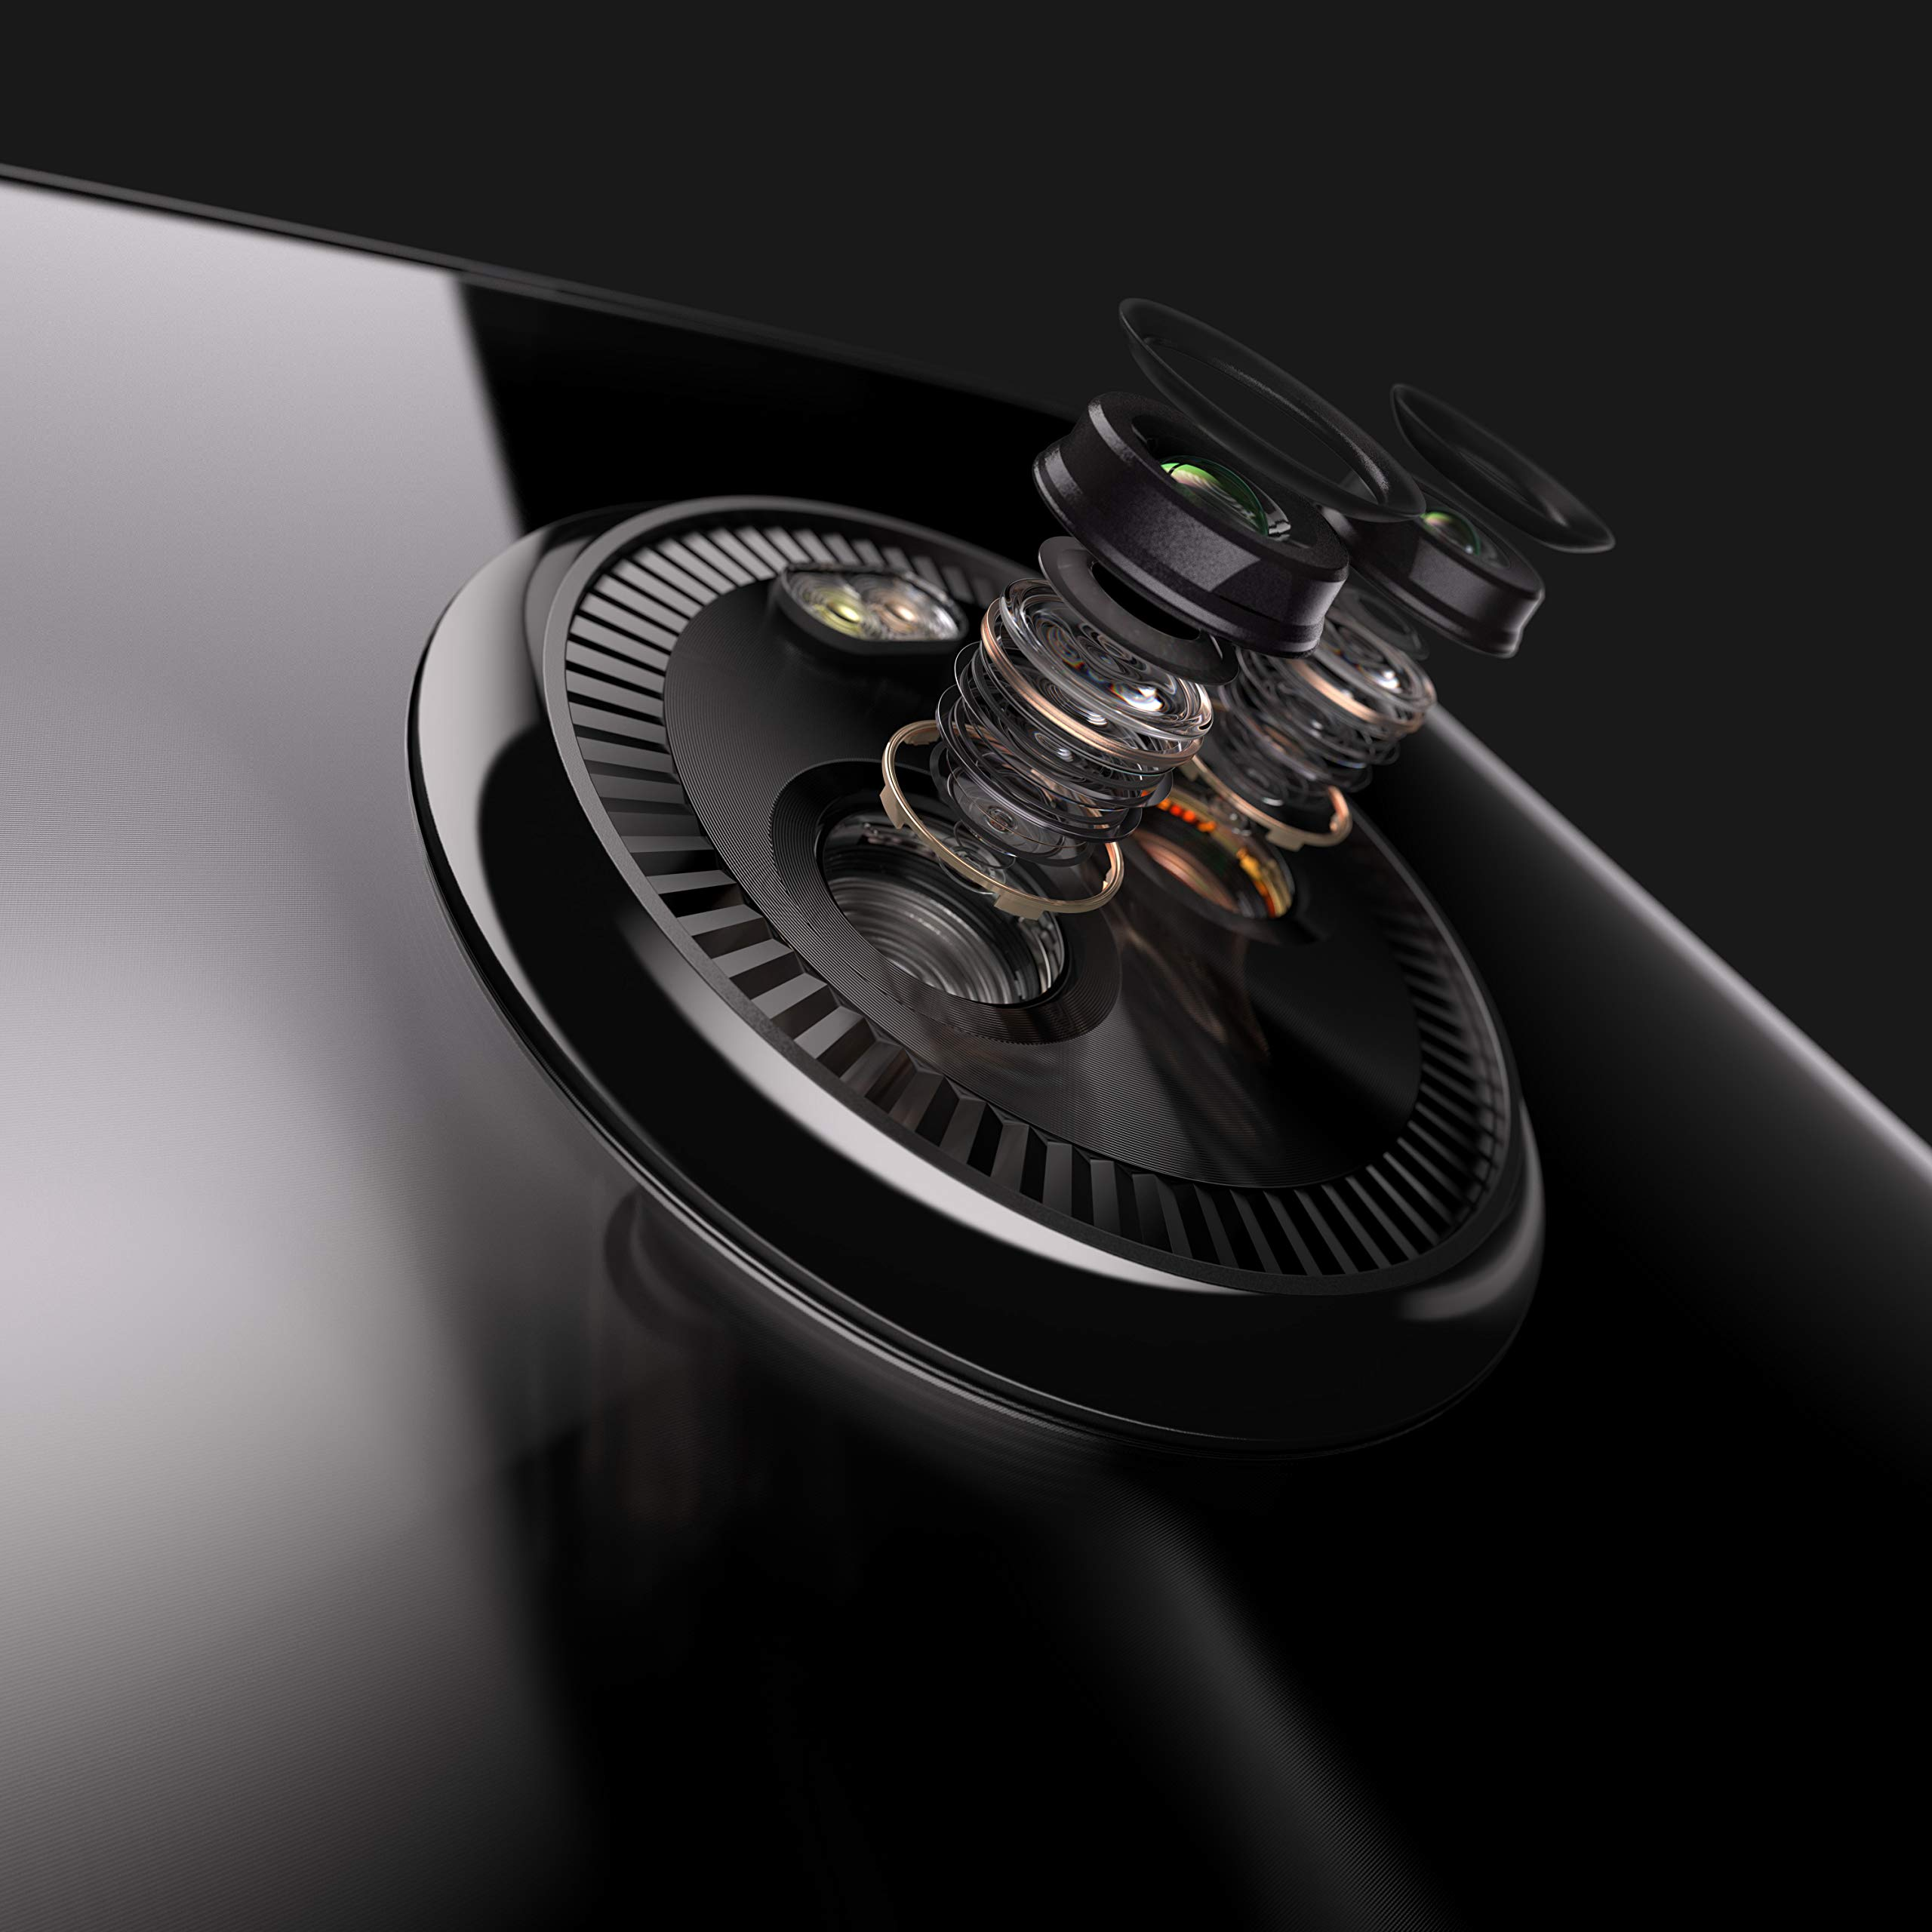 Moto X4 Android One Edition - 64GB - Black - Unlocked by Motorola (Image #5)